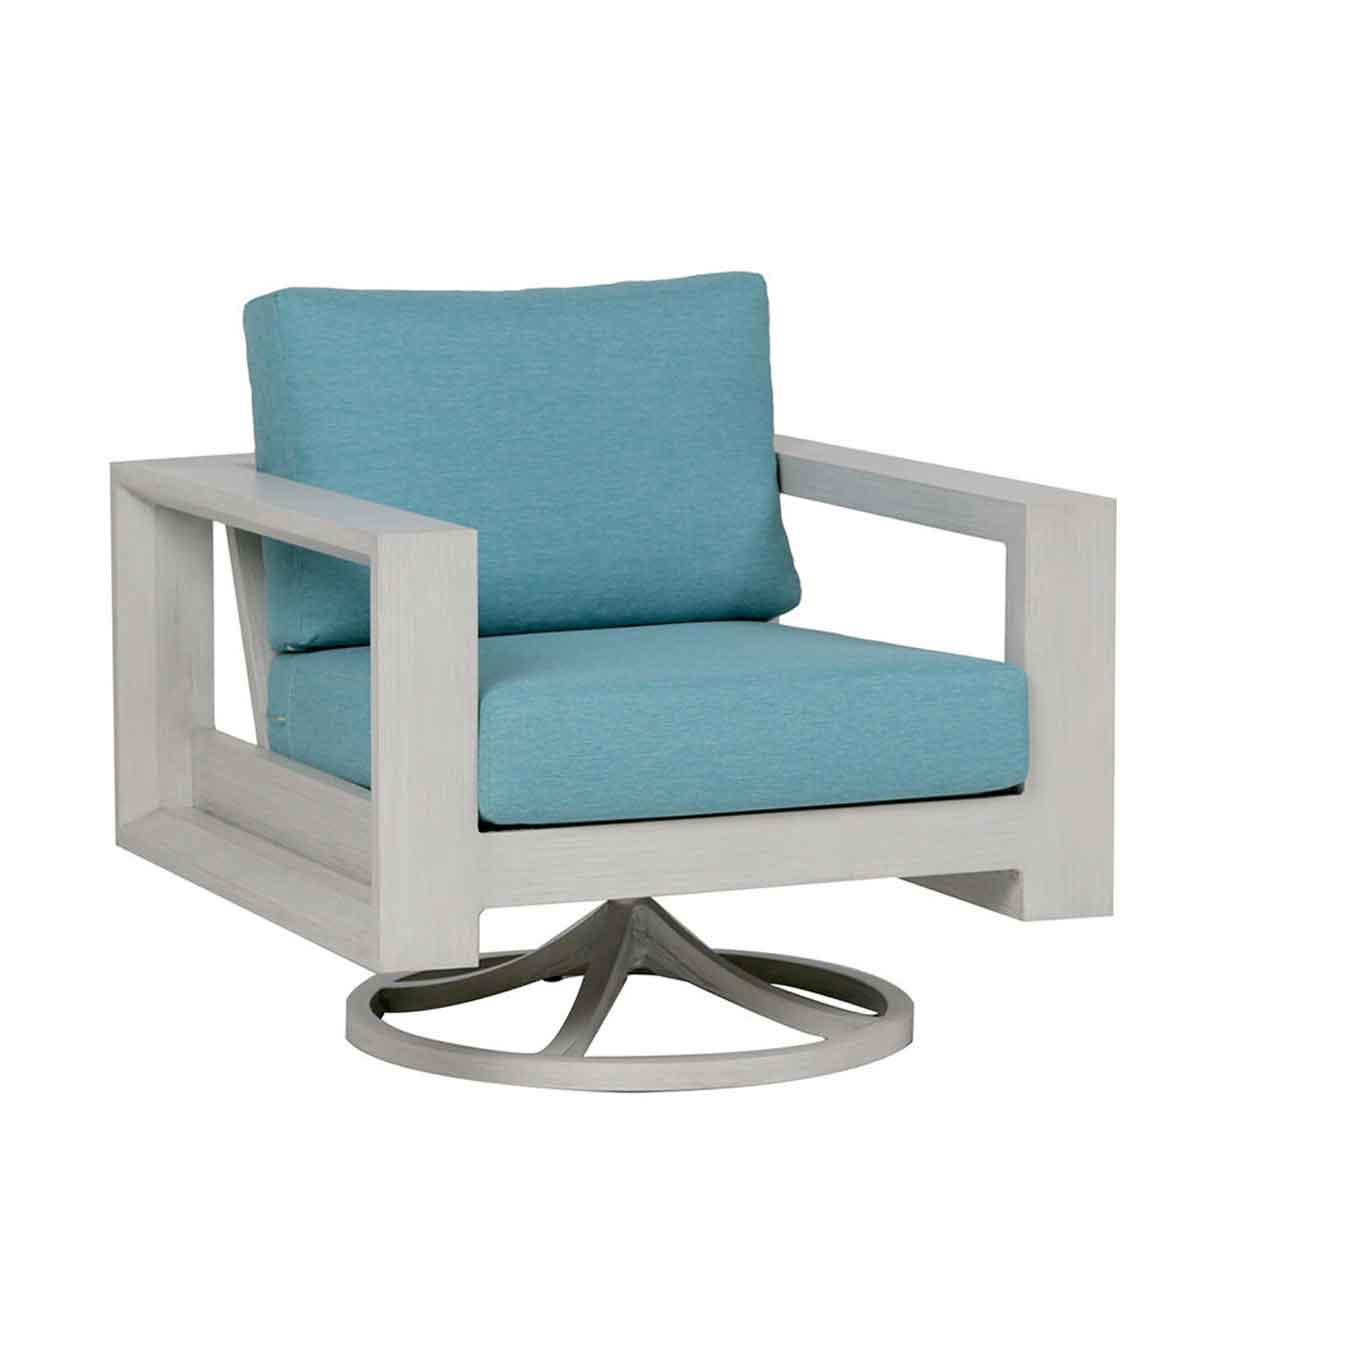 Element 5.0 Swivel Rocker Chair - Whitewash